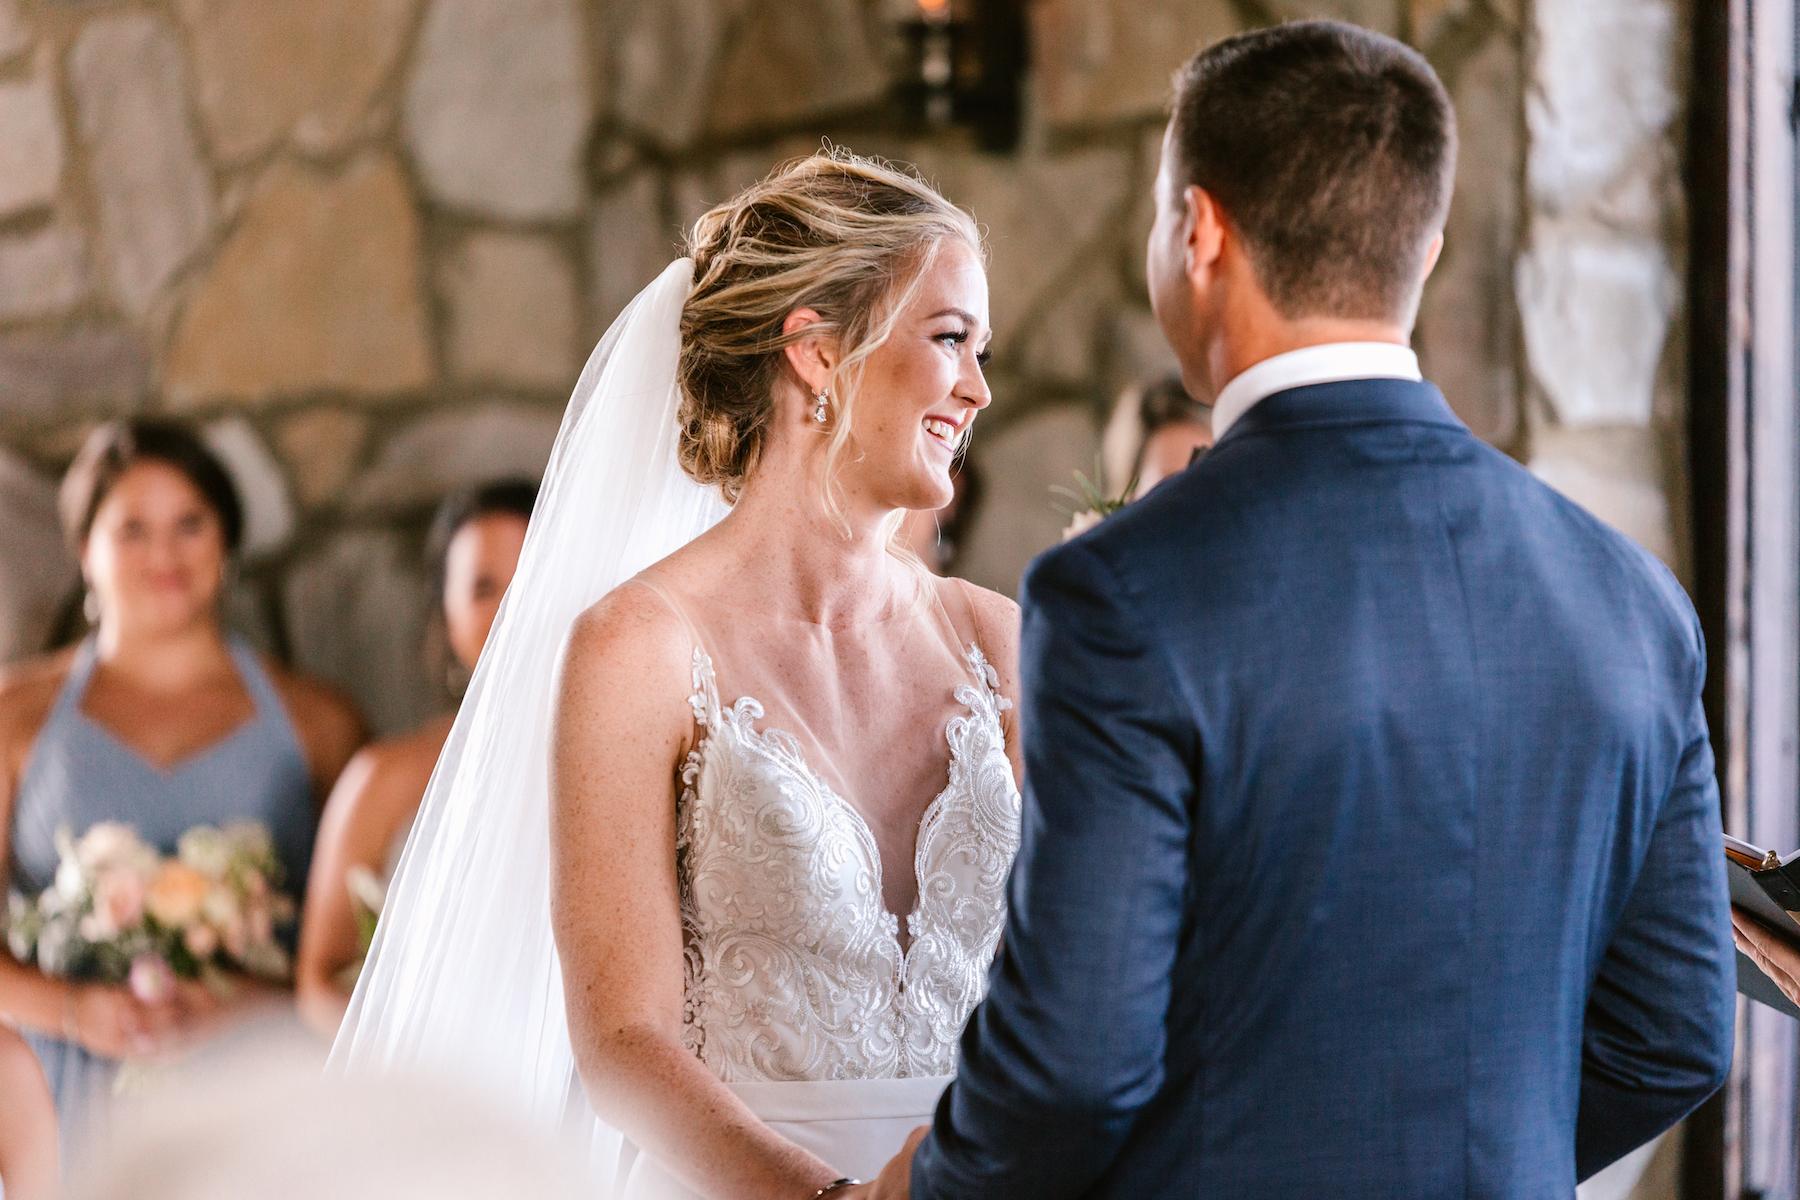 wedding-engagement-photographer-spartanburg-greenville-columbia-carolina-south-north-488.JPG